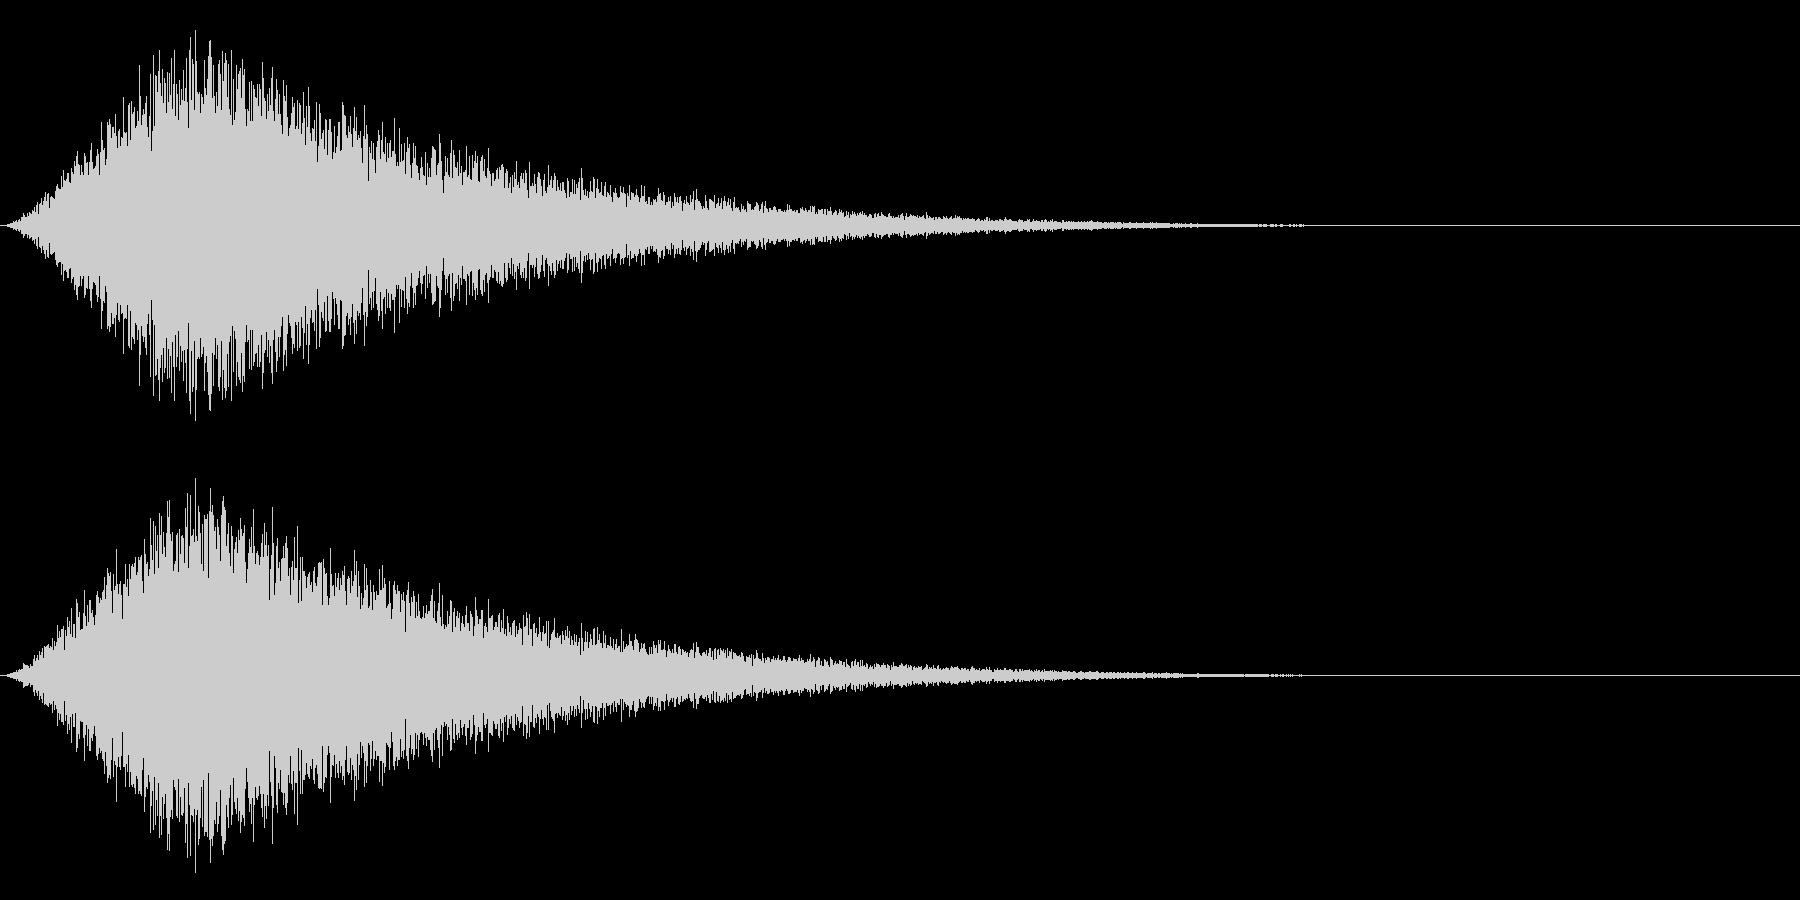 Noise 攻撃をかわす・逃げるSFXの未再生の波形